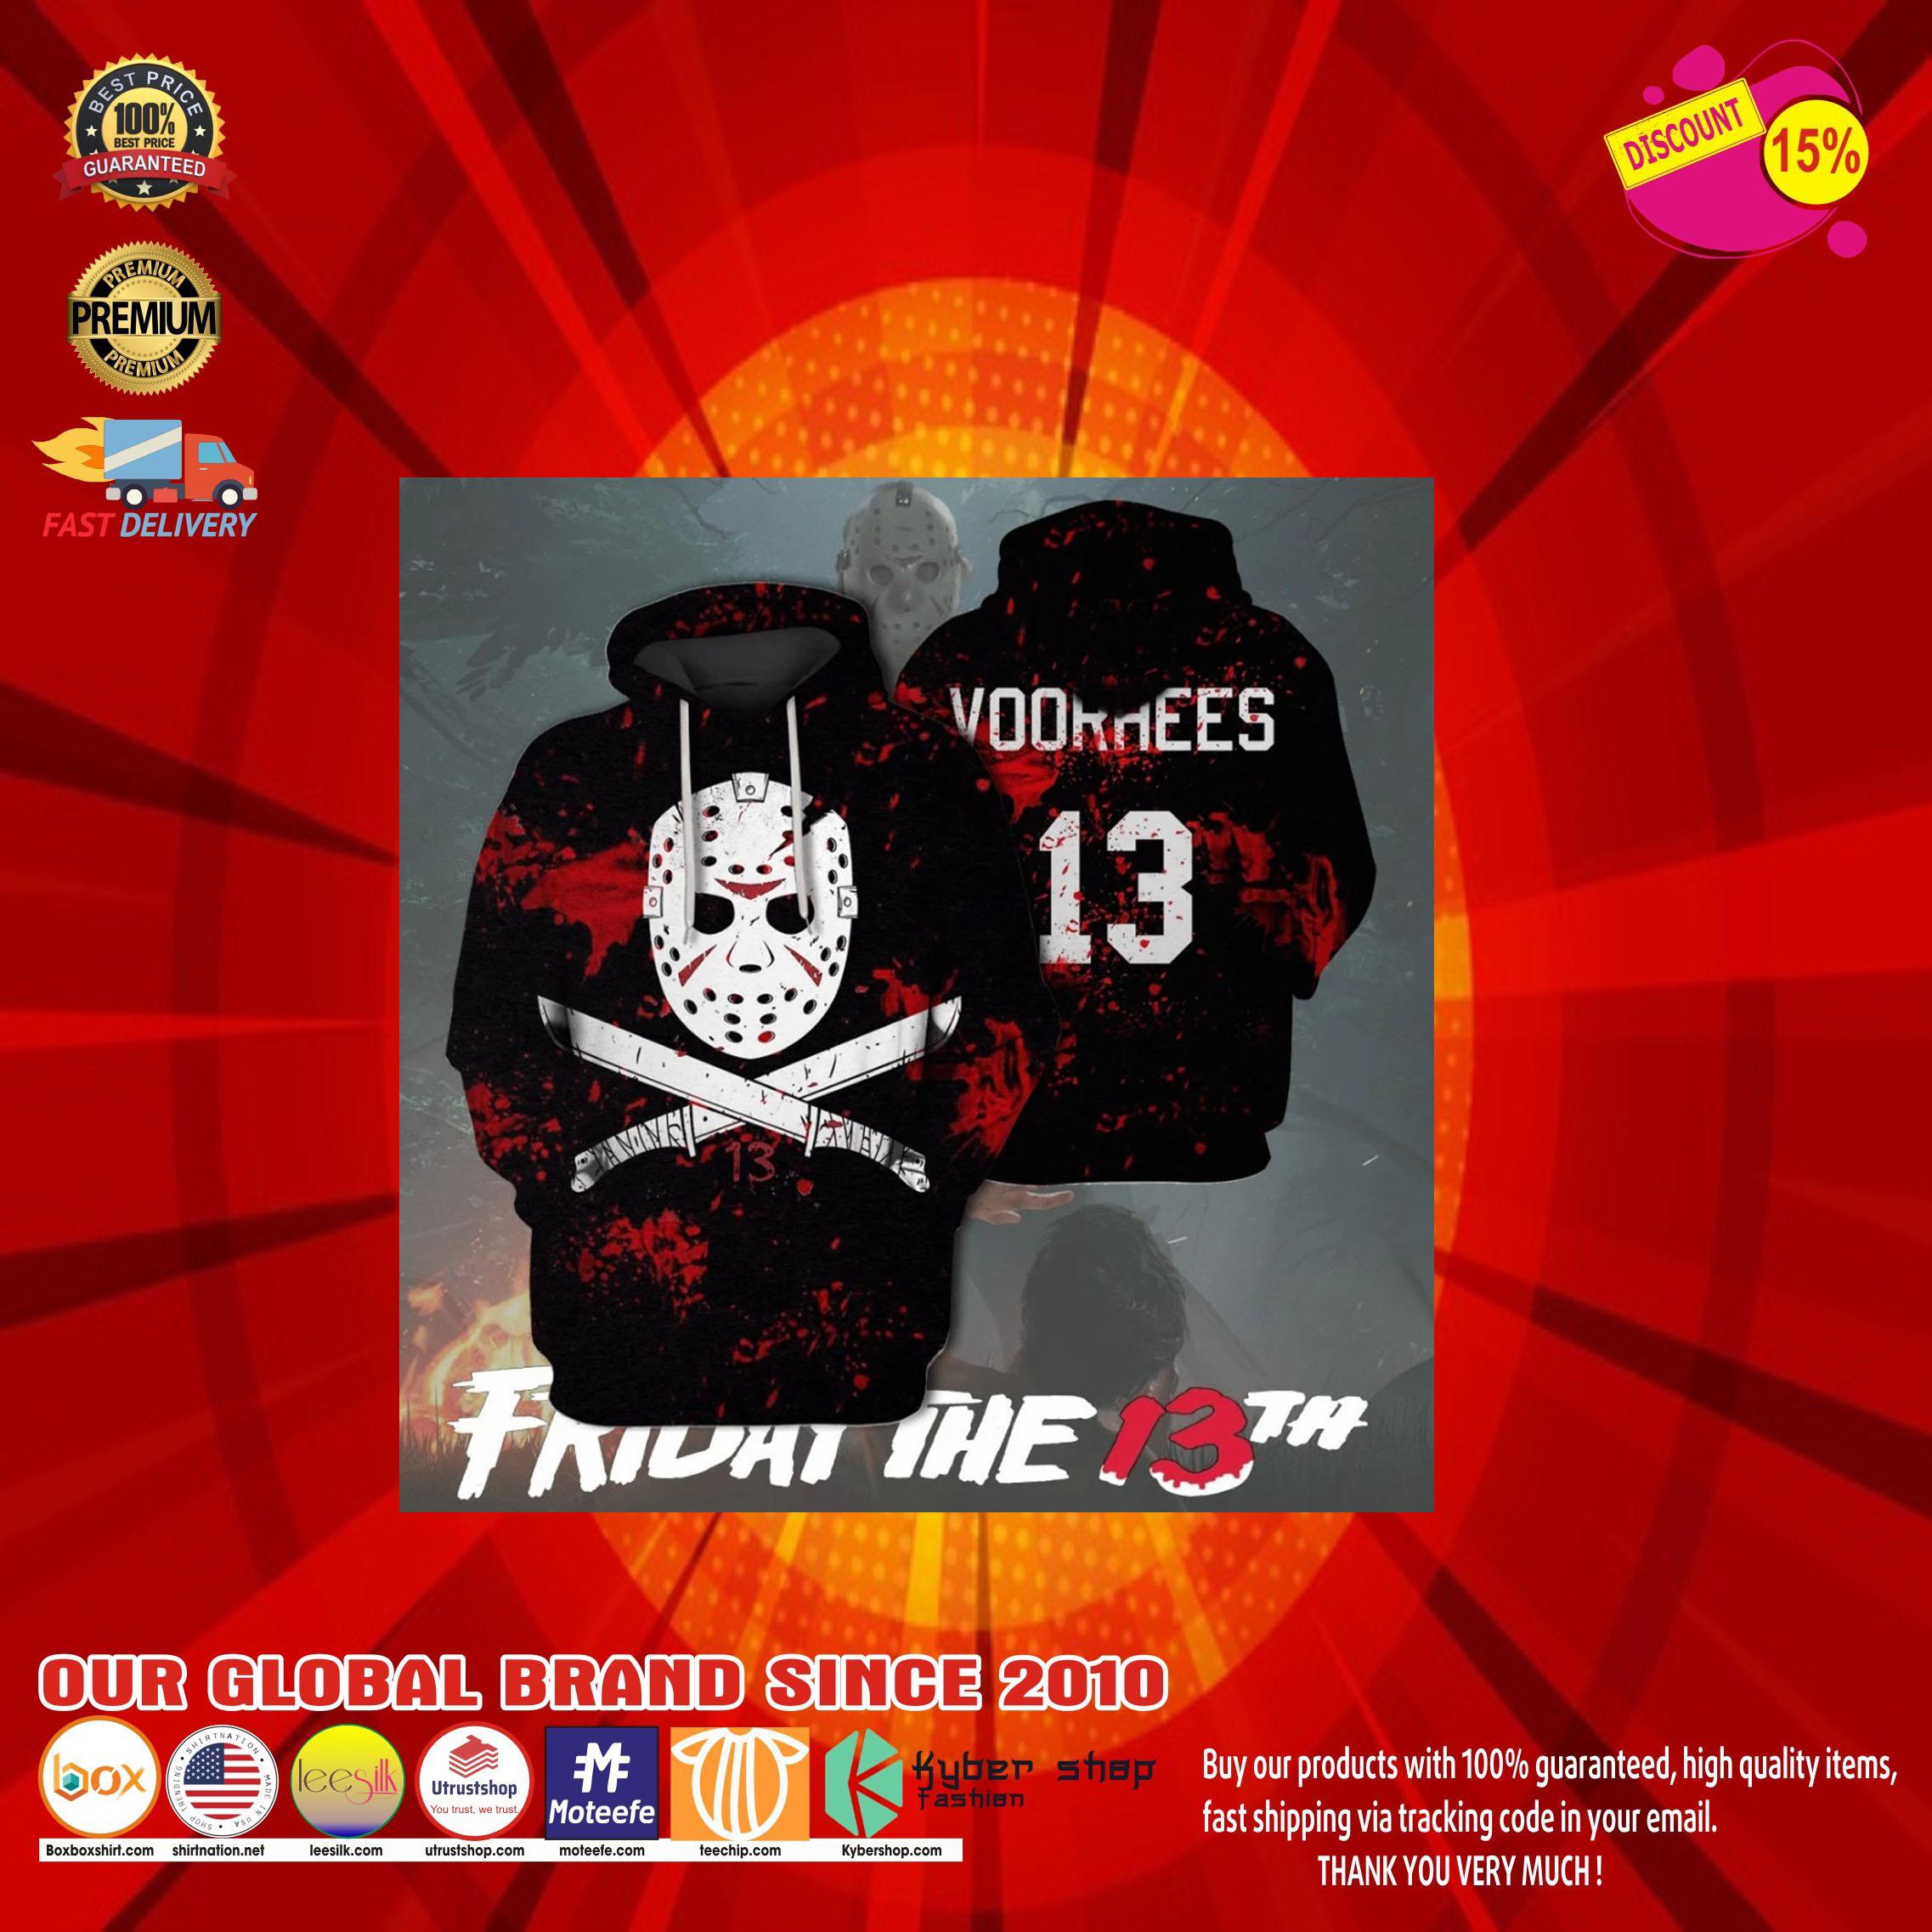 Jason voorhees friday the 13th 3d hoodie10